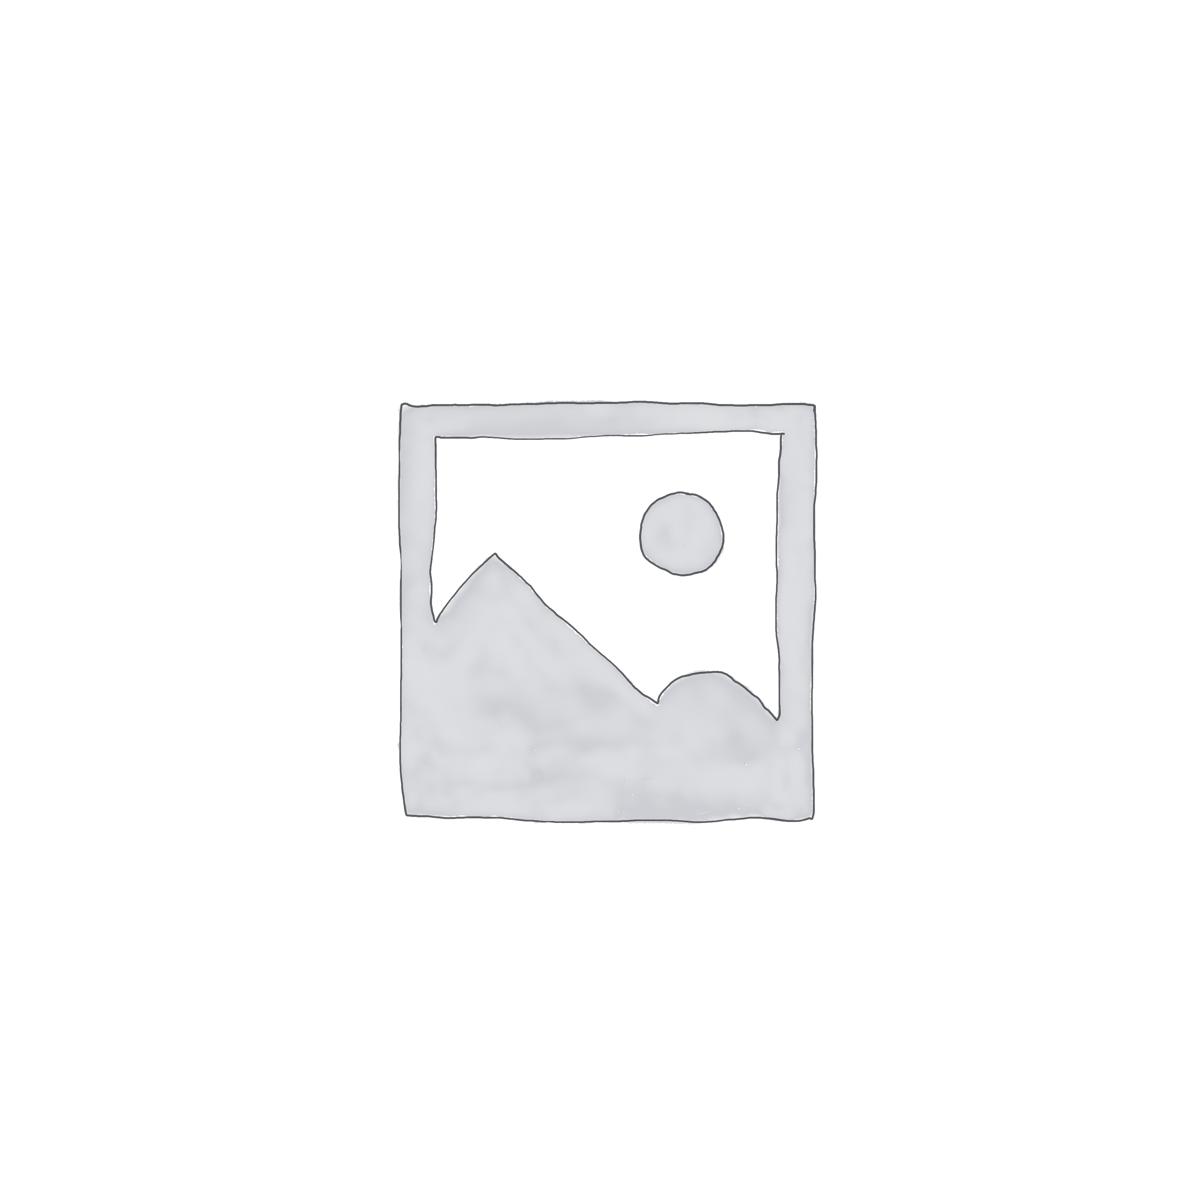 Blue Waves Wallpaper Mural